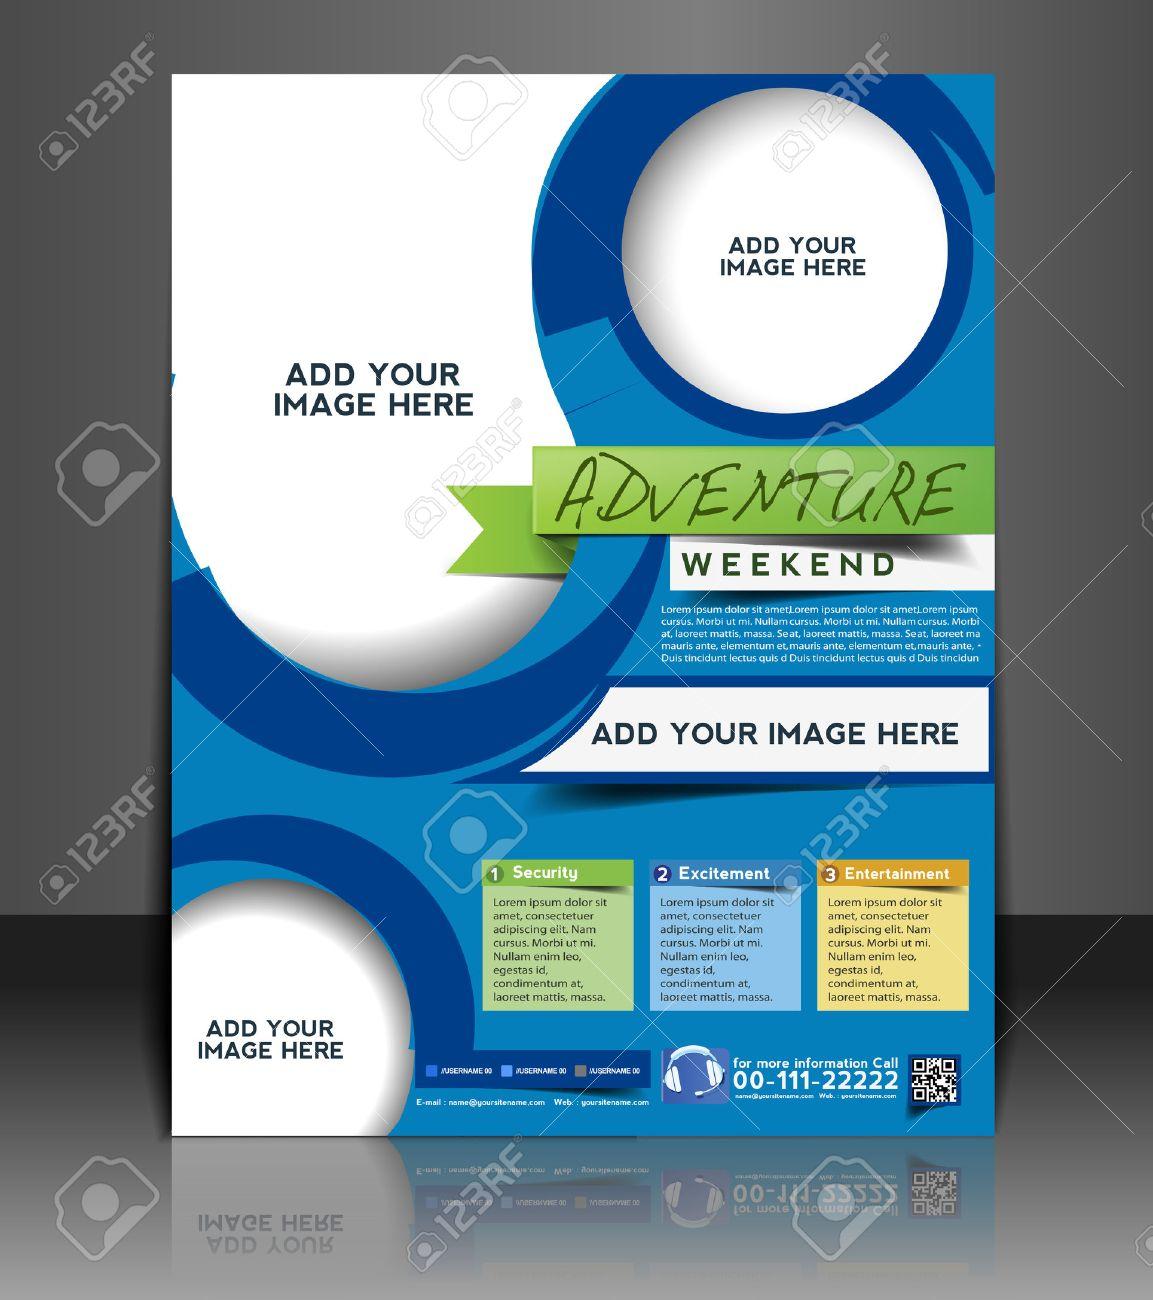 Adventurer Flyer & Poster Template Design Stock Vector - 26562971